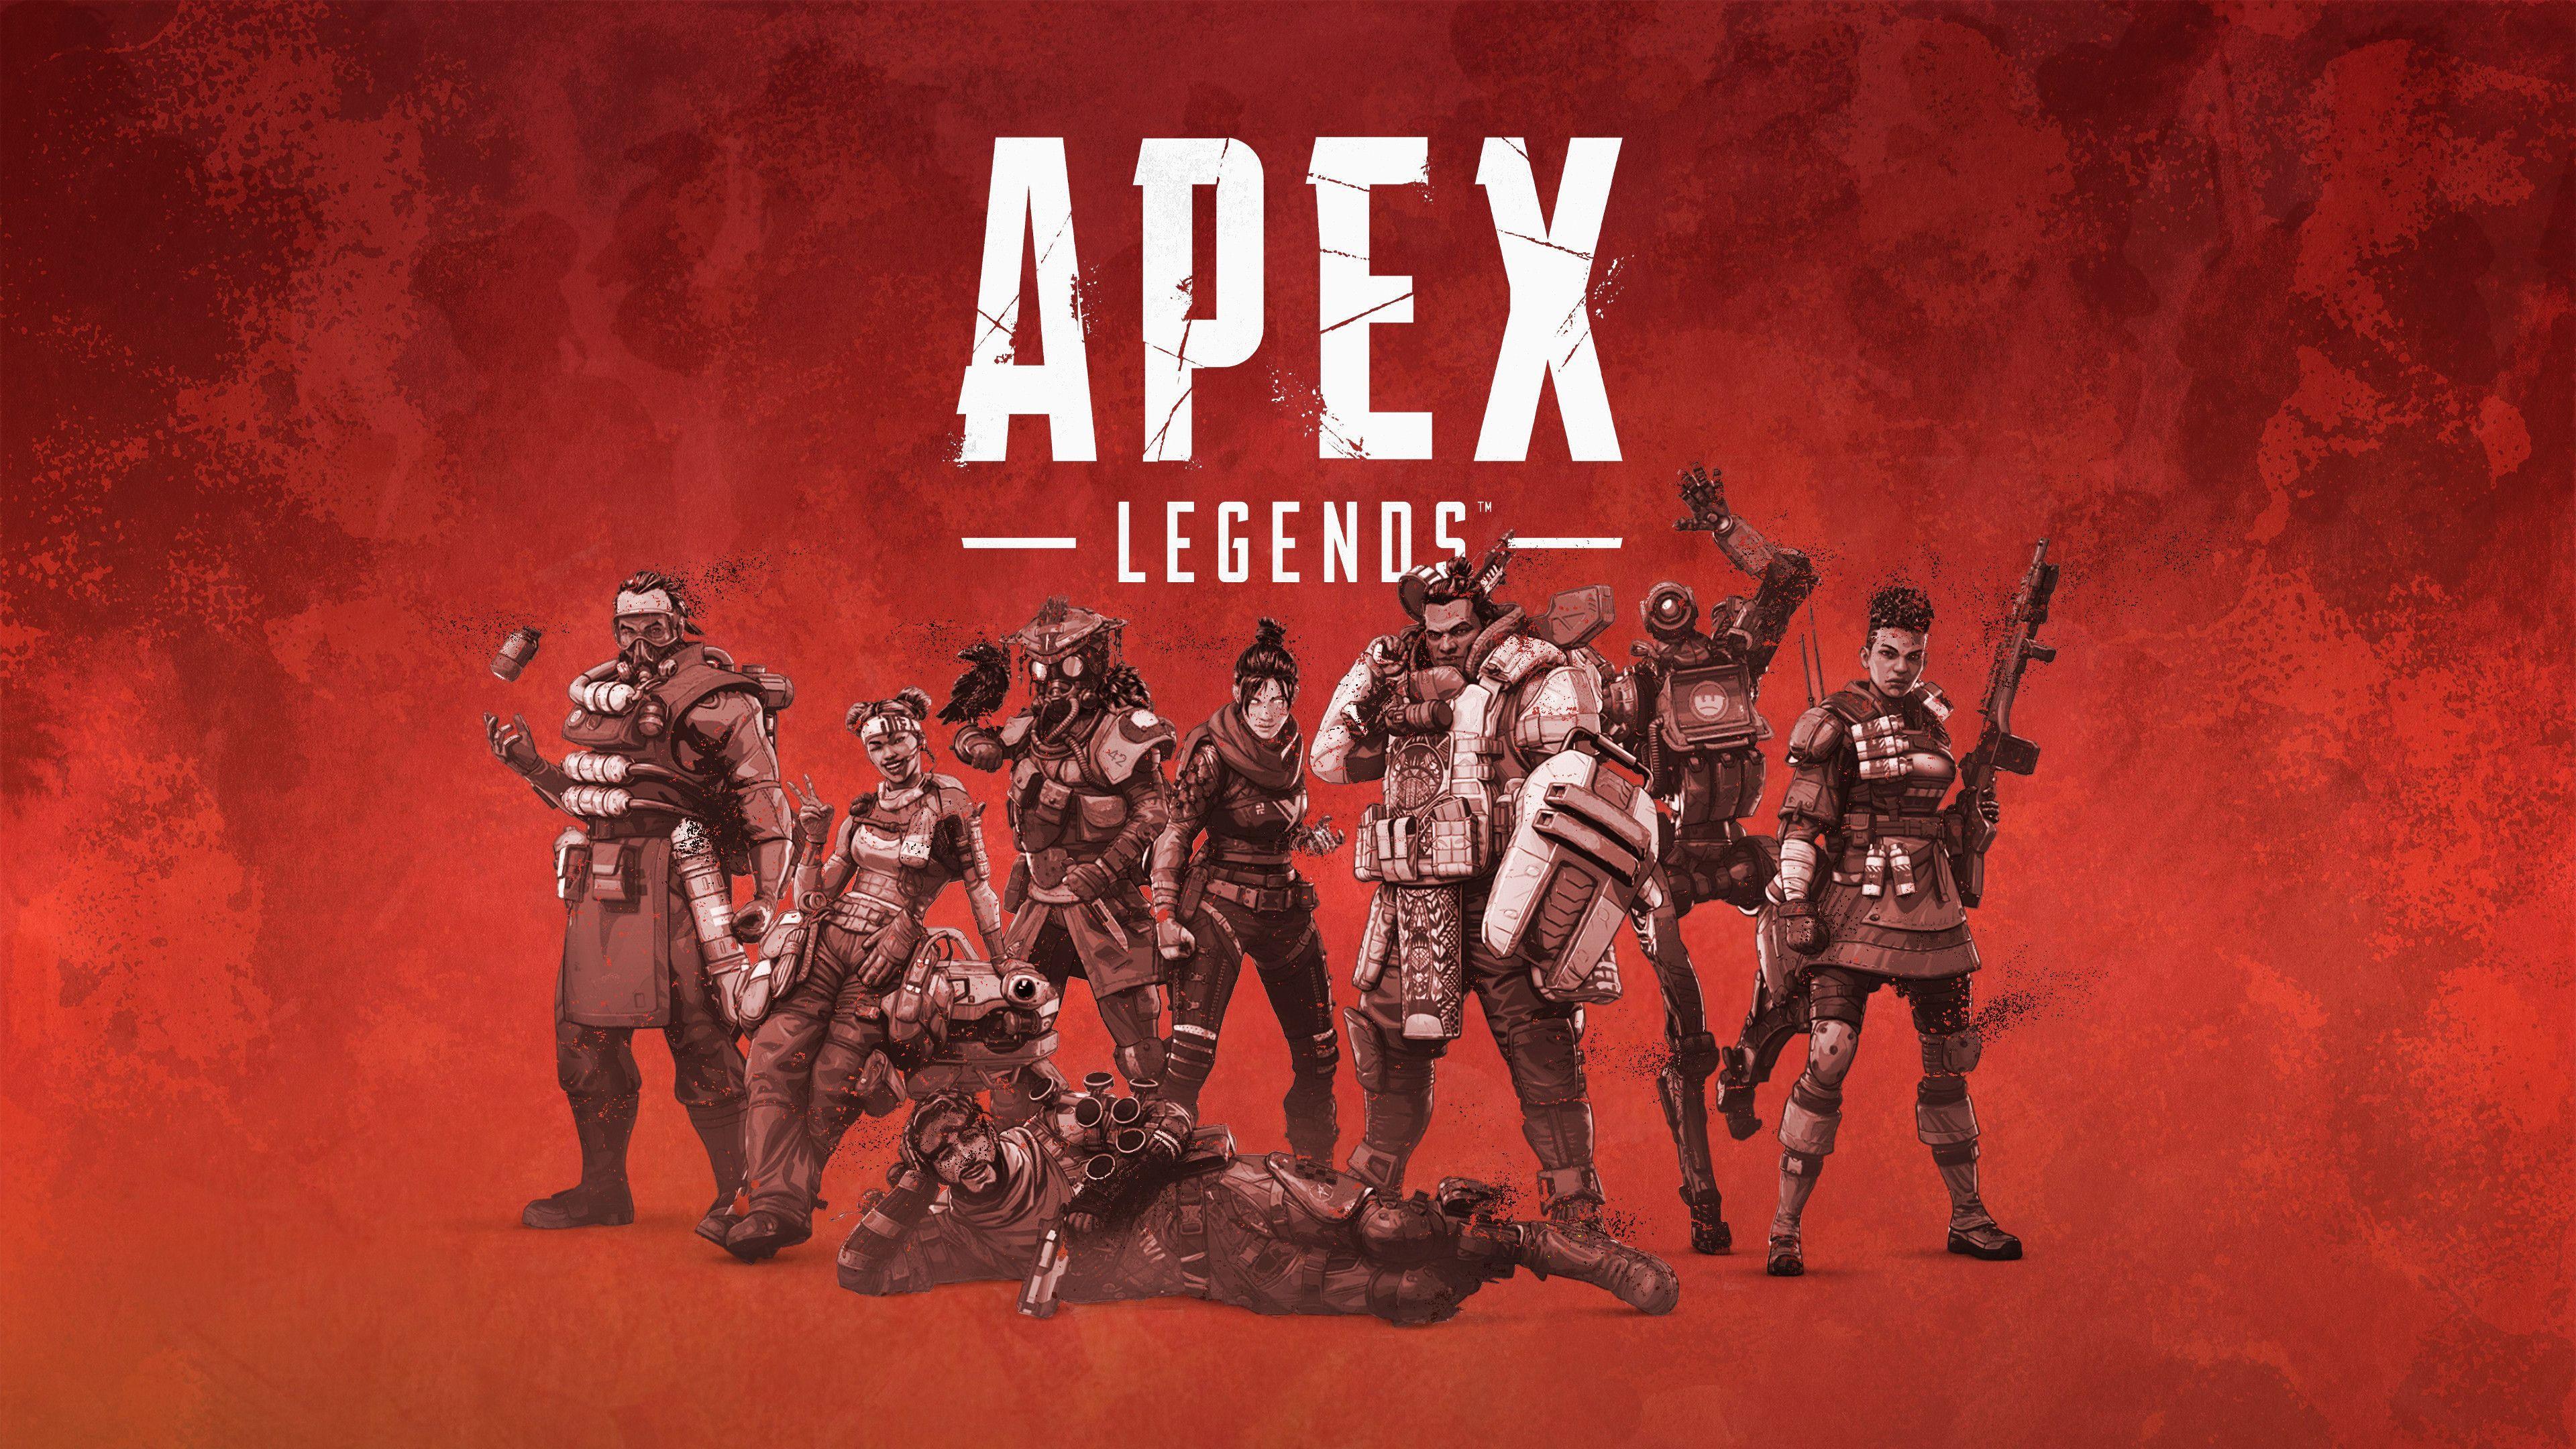 Apex Legends Wallpapers Top Free Apex Legends Backgrounds